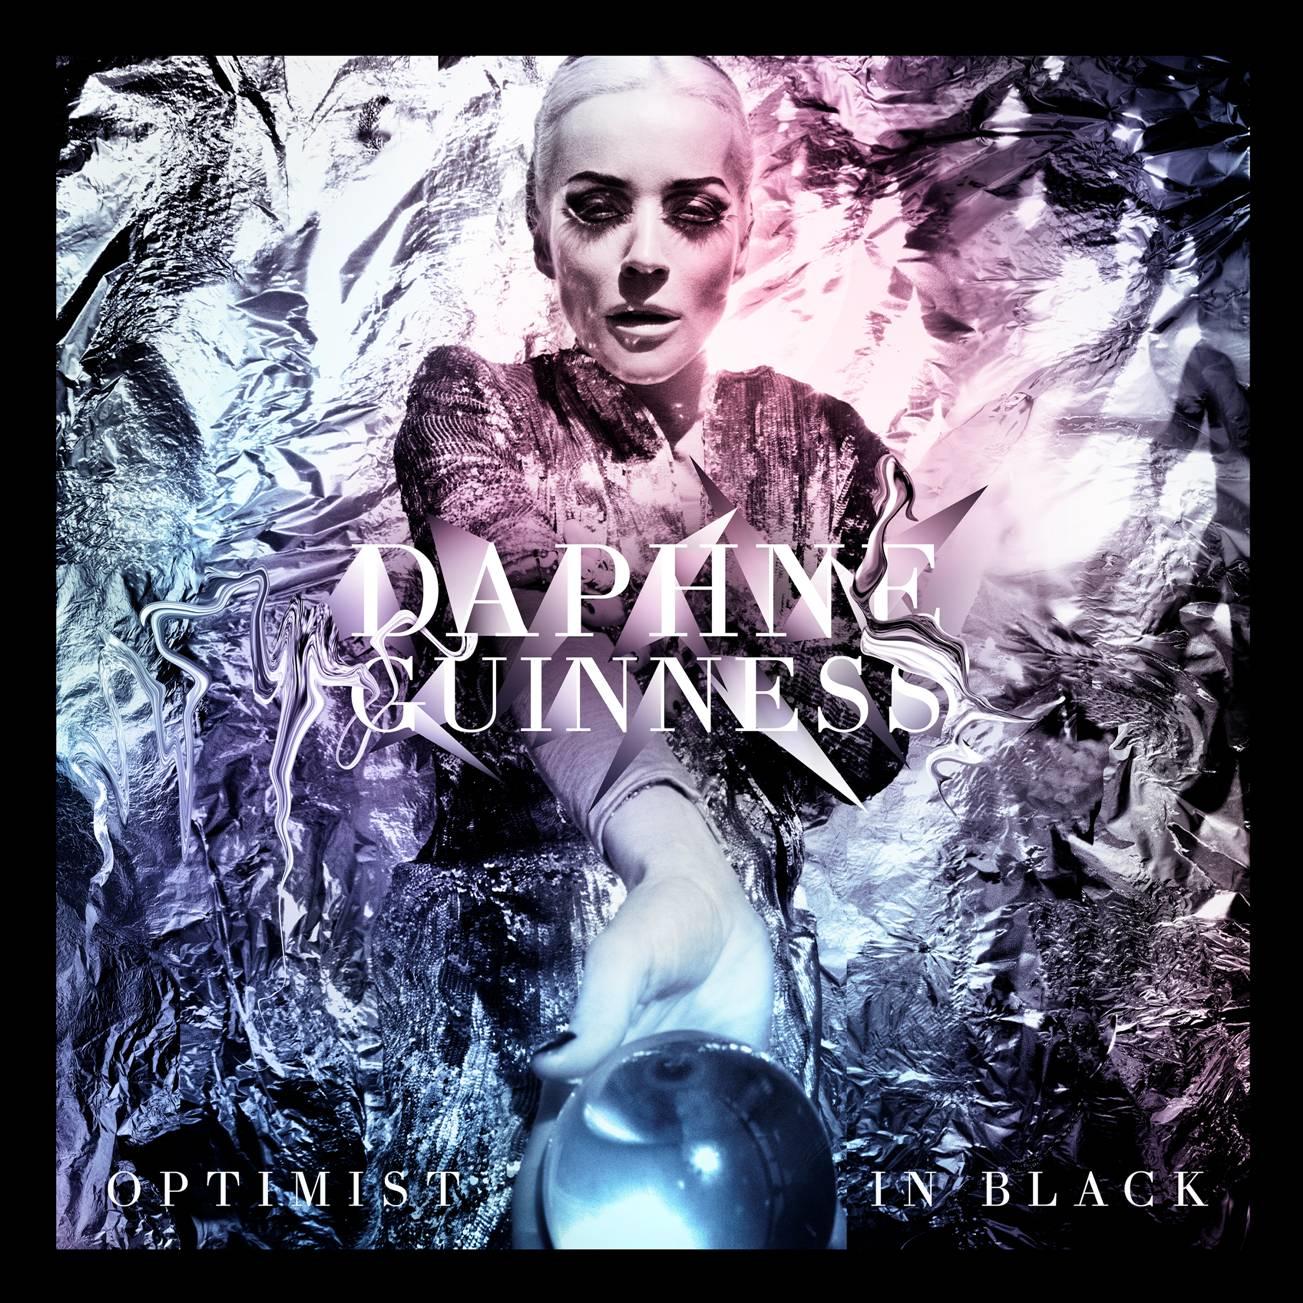 Optimist in Black (Digital Download)